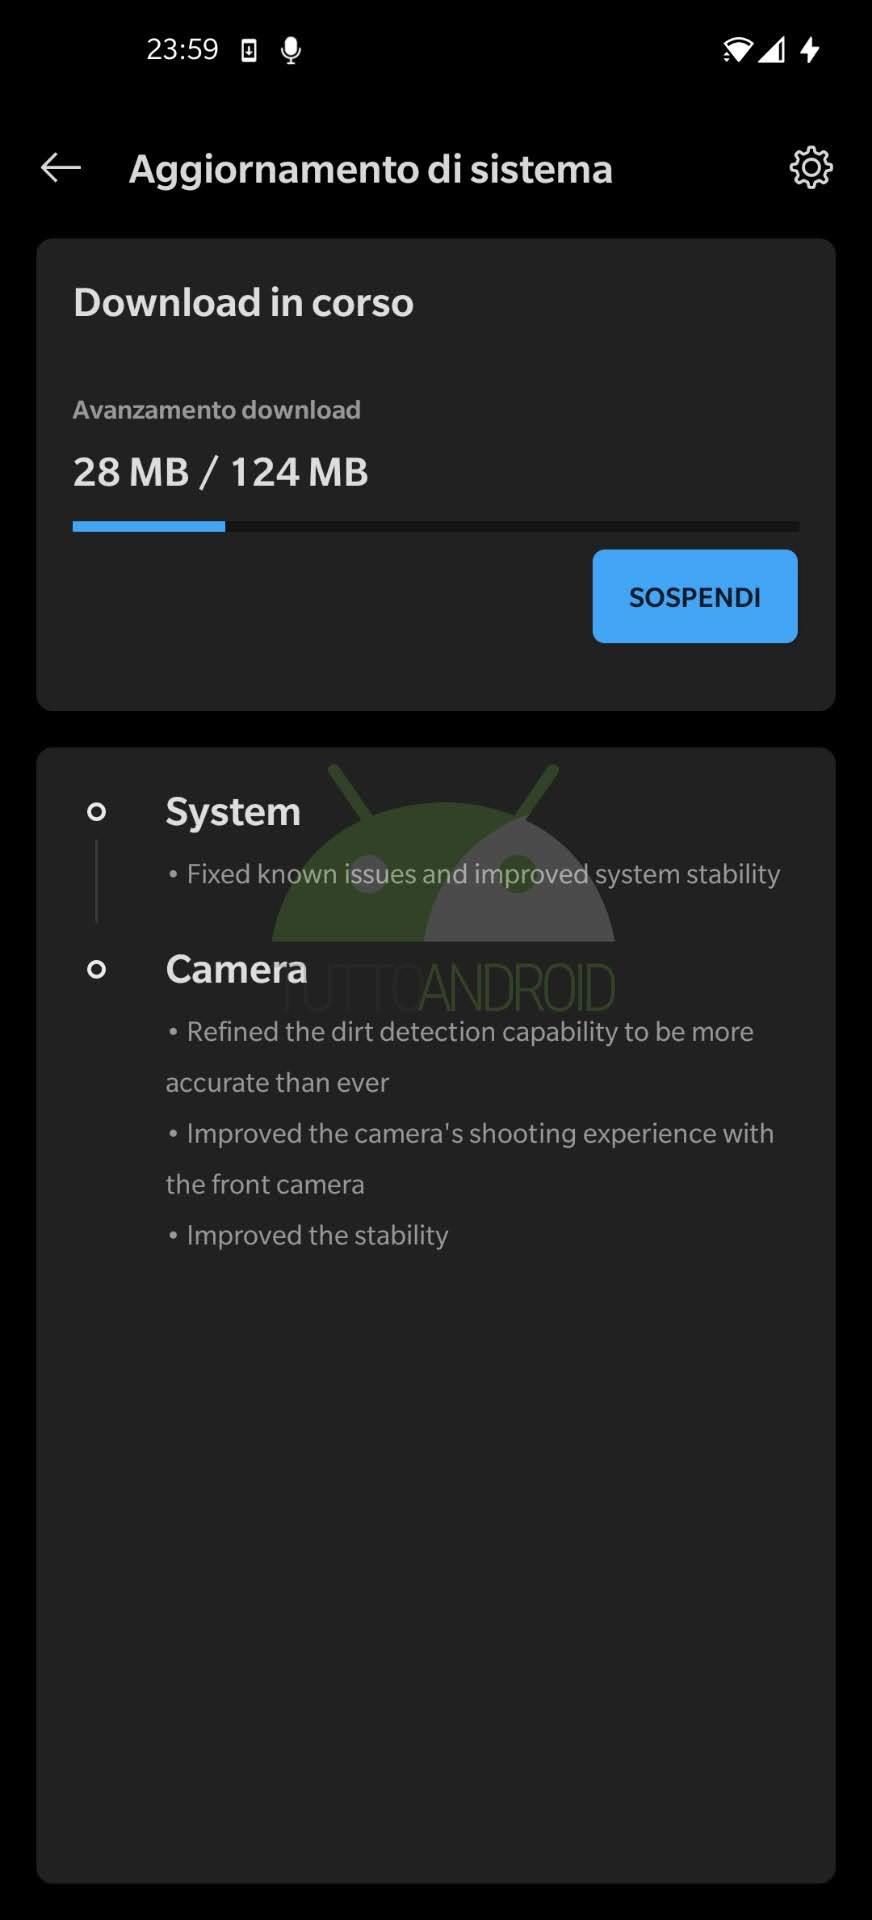 oneplus 8 pro aggiornamento oxygenos 10.5.6